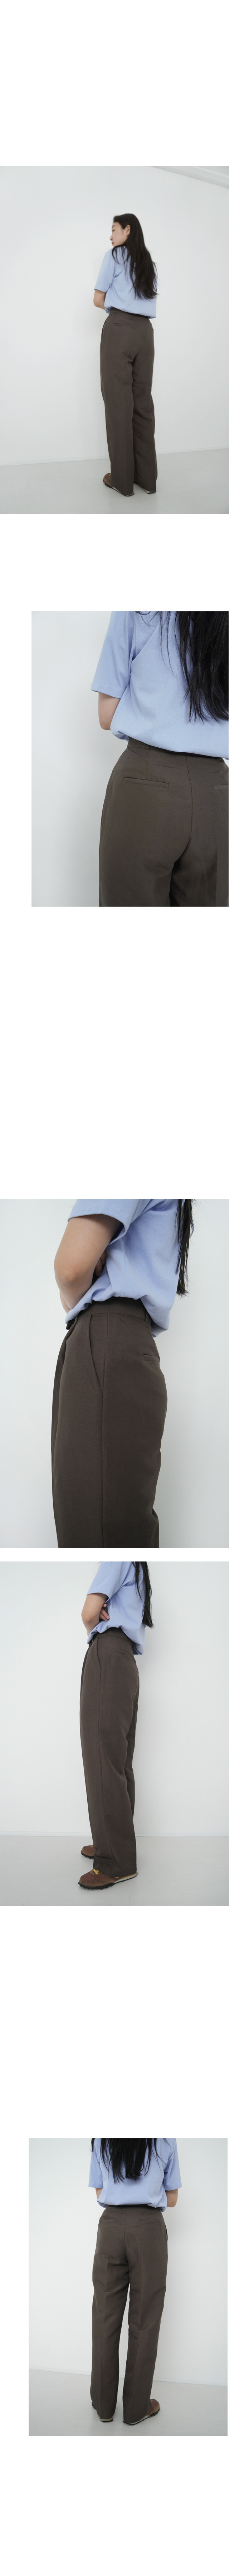 clean standard fit slacks